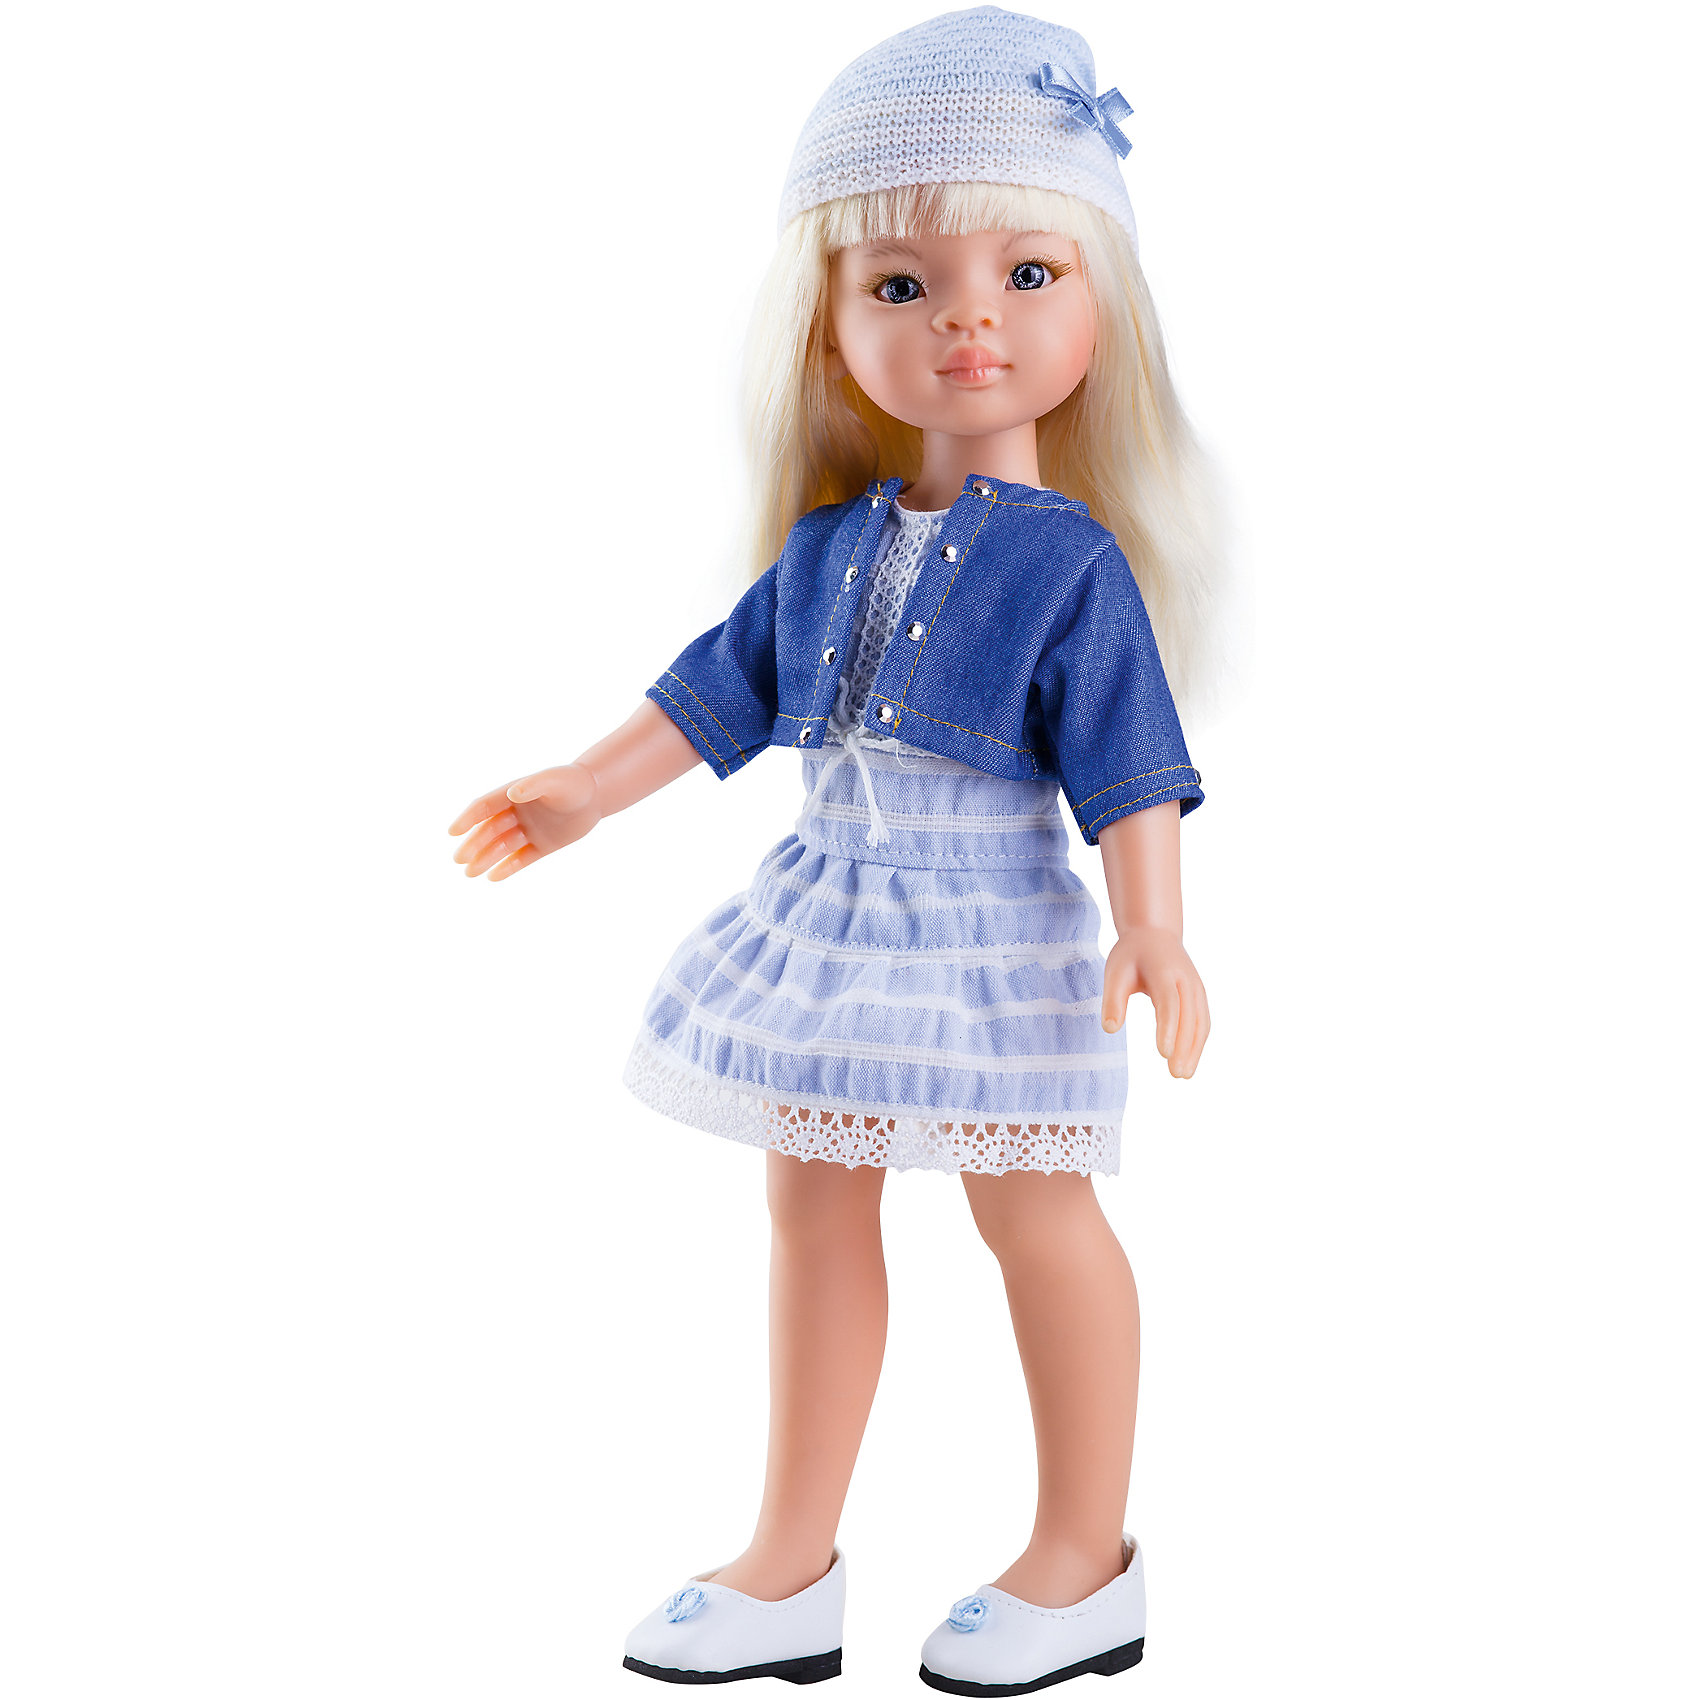 Кукла Маника, 32 см, Paola ReinaКлассические куклы<br><br><br>Ширина мм: 375<br>Глубина мм: 175<br>Высота мм: 105<br>Вес г: 625<br>Возраст от месяцев: 36<br>Возраст до месяцев: 144<br>Пол: Женский<br>Возраст: Детский<br>SKU: 6671051